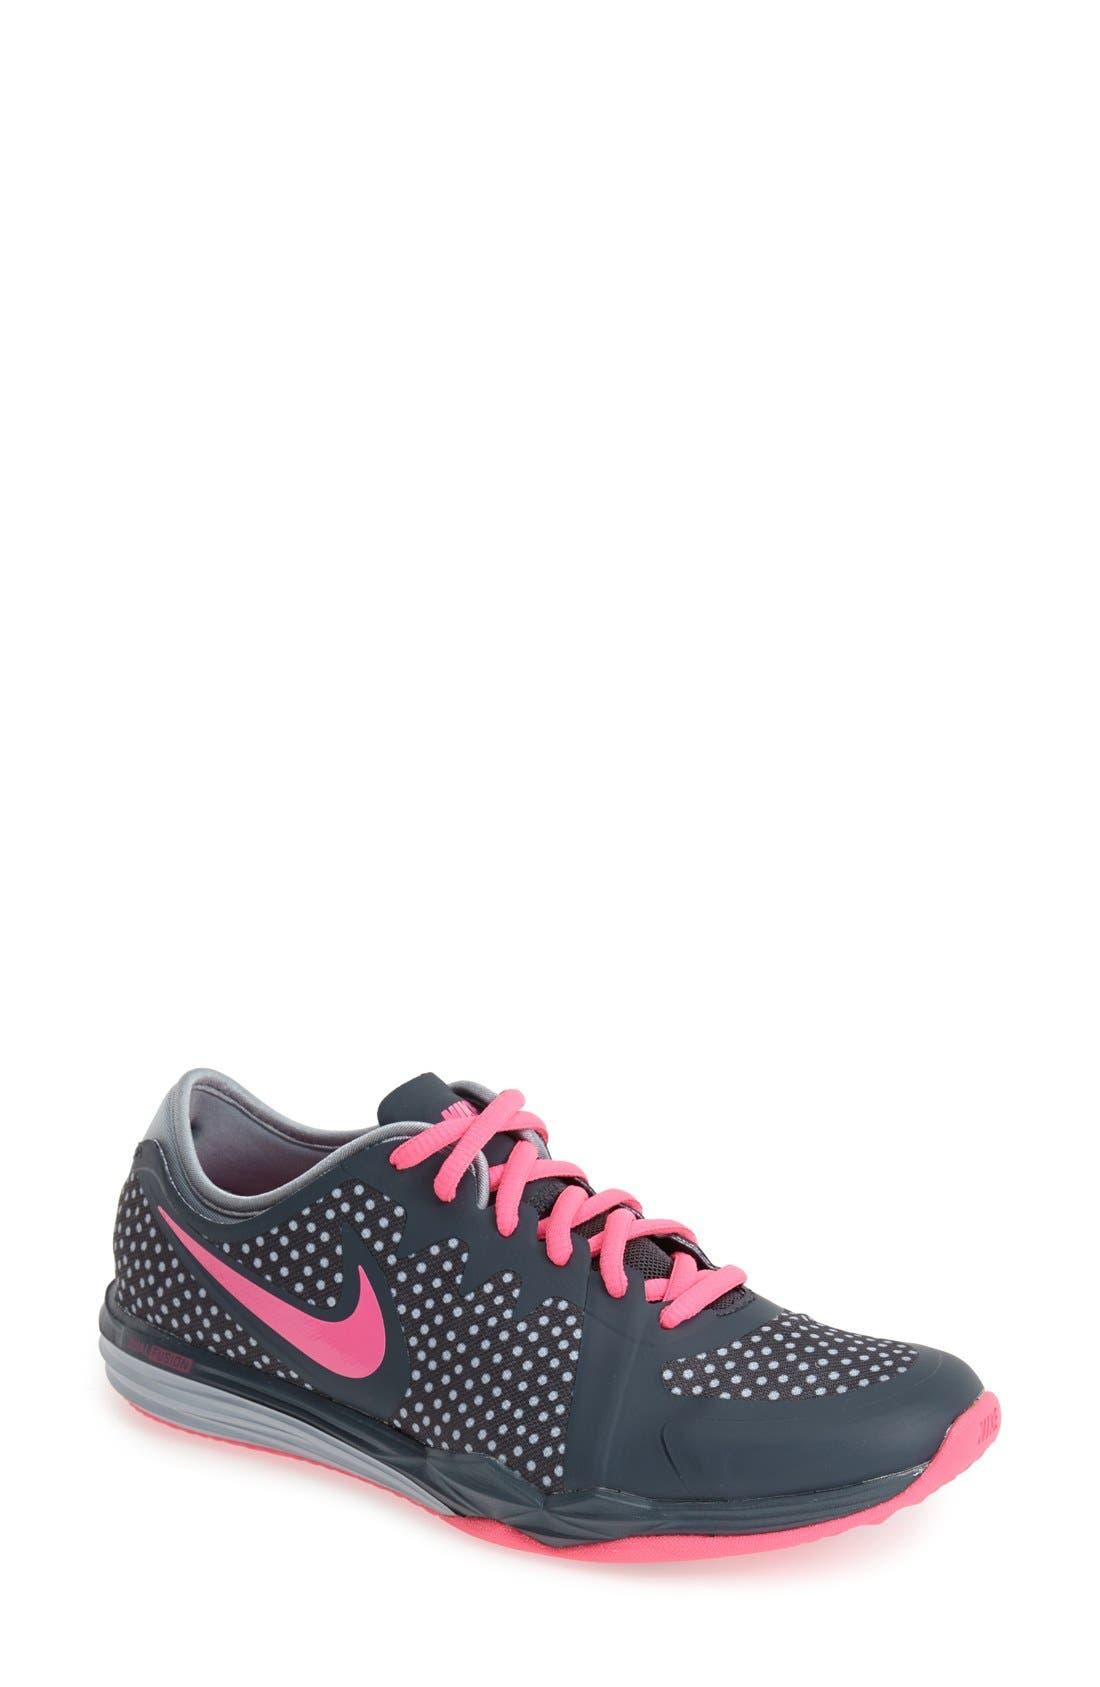 Alternate Image 1 Selected - Nike 'Dual Fusion 3' Training Shoe (Women)